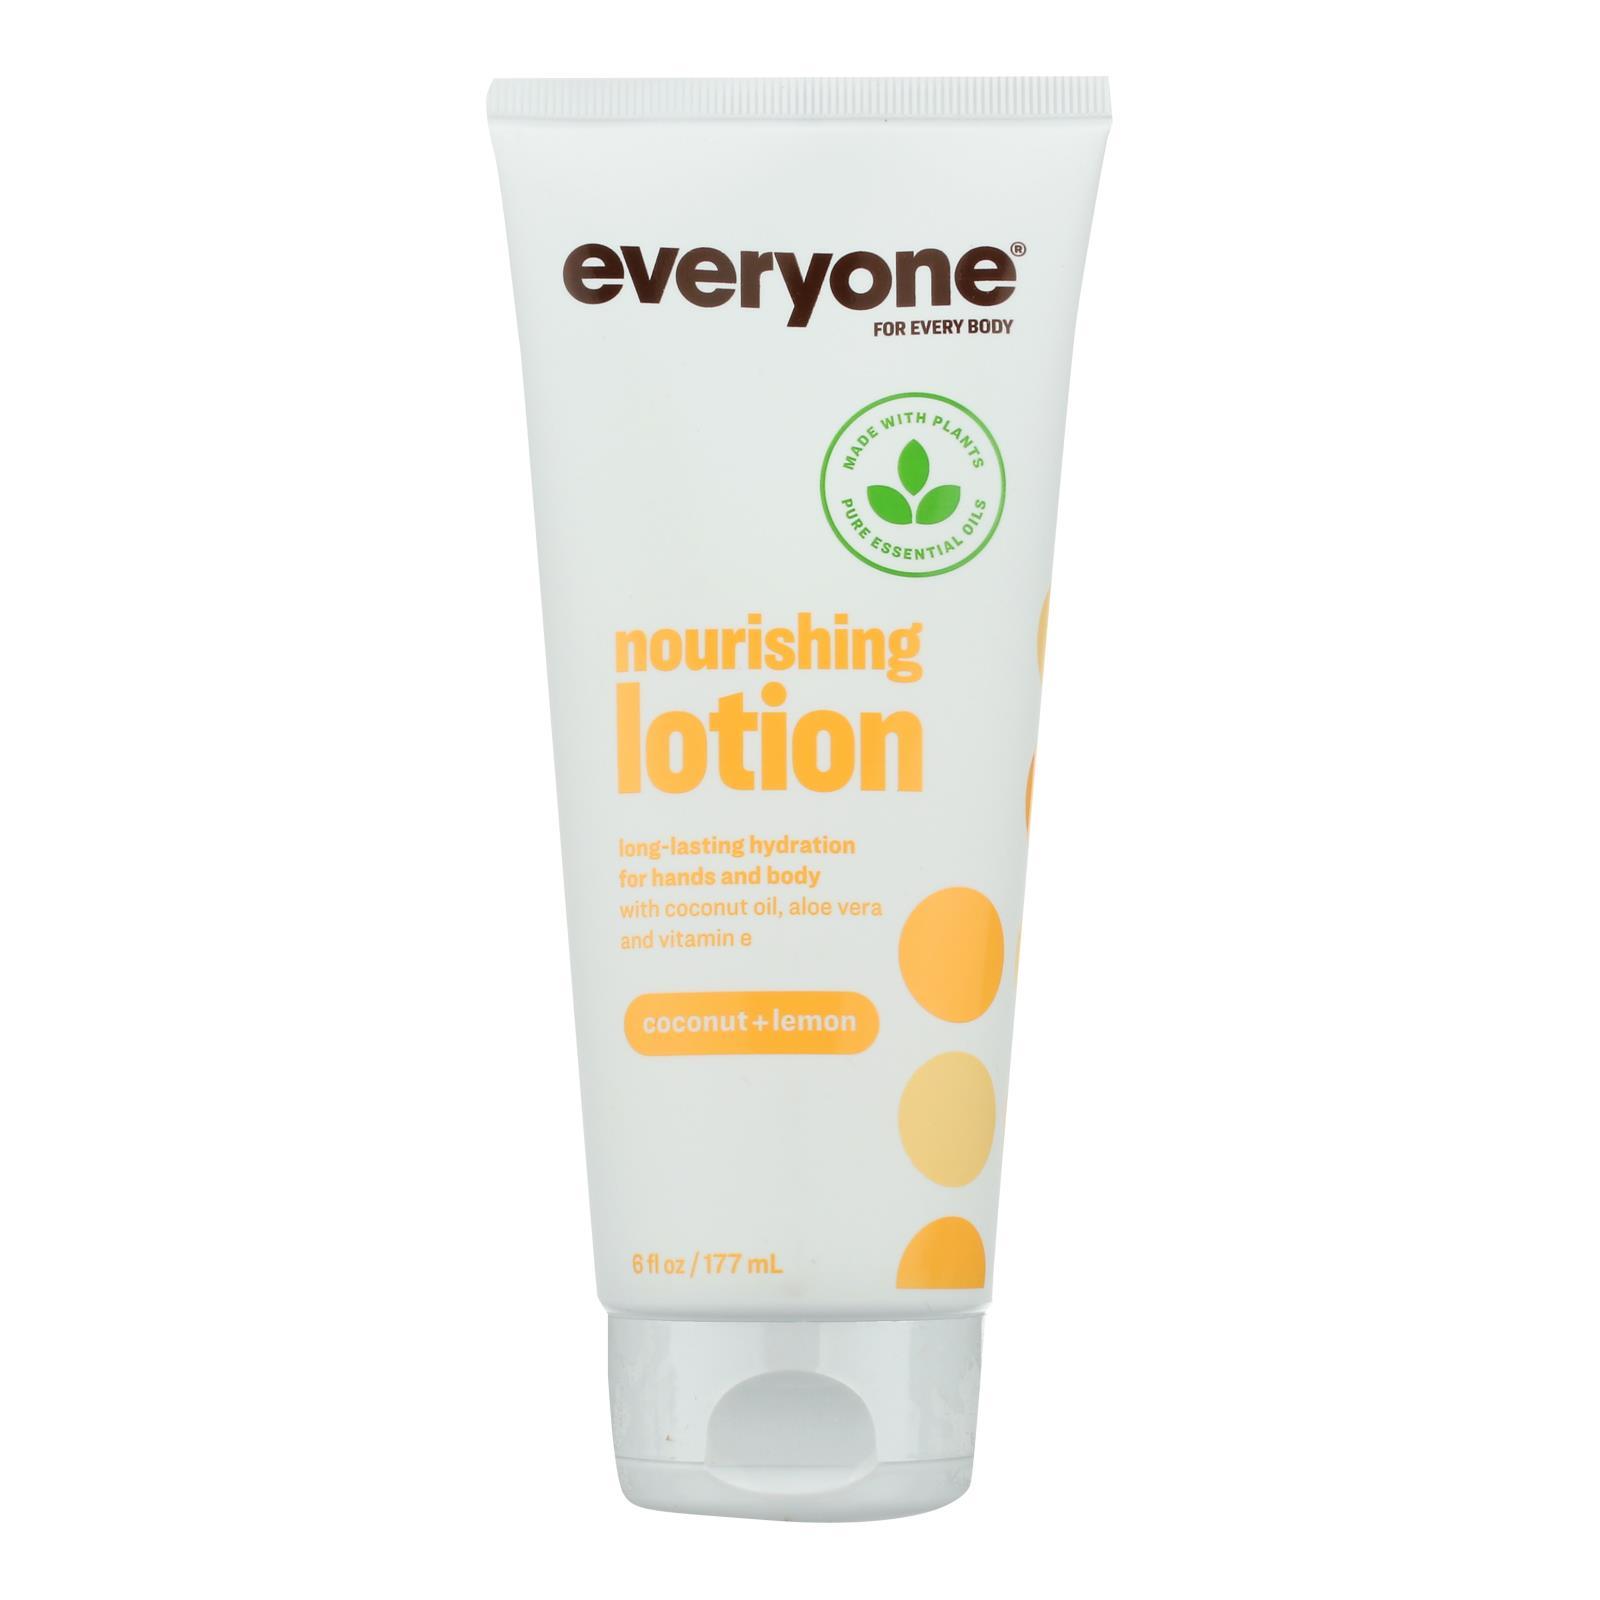 Everyone Lotion - Coconut Lemon - 6 oz